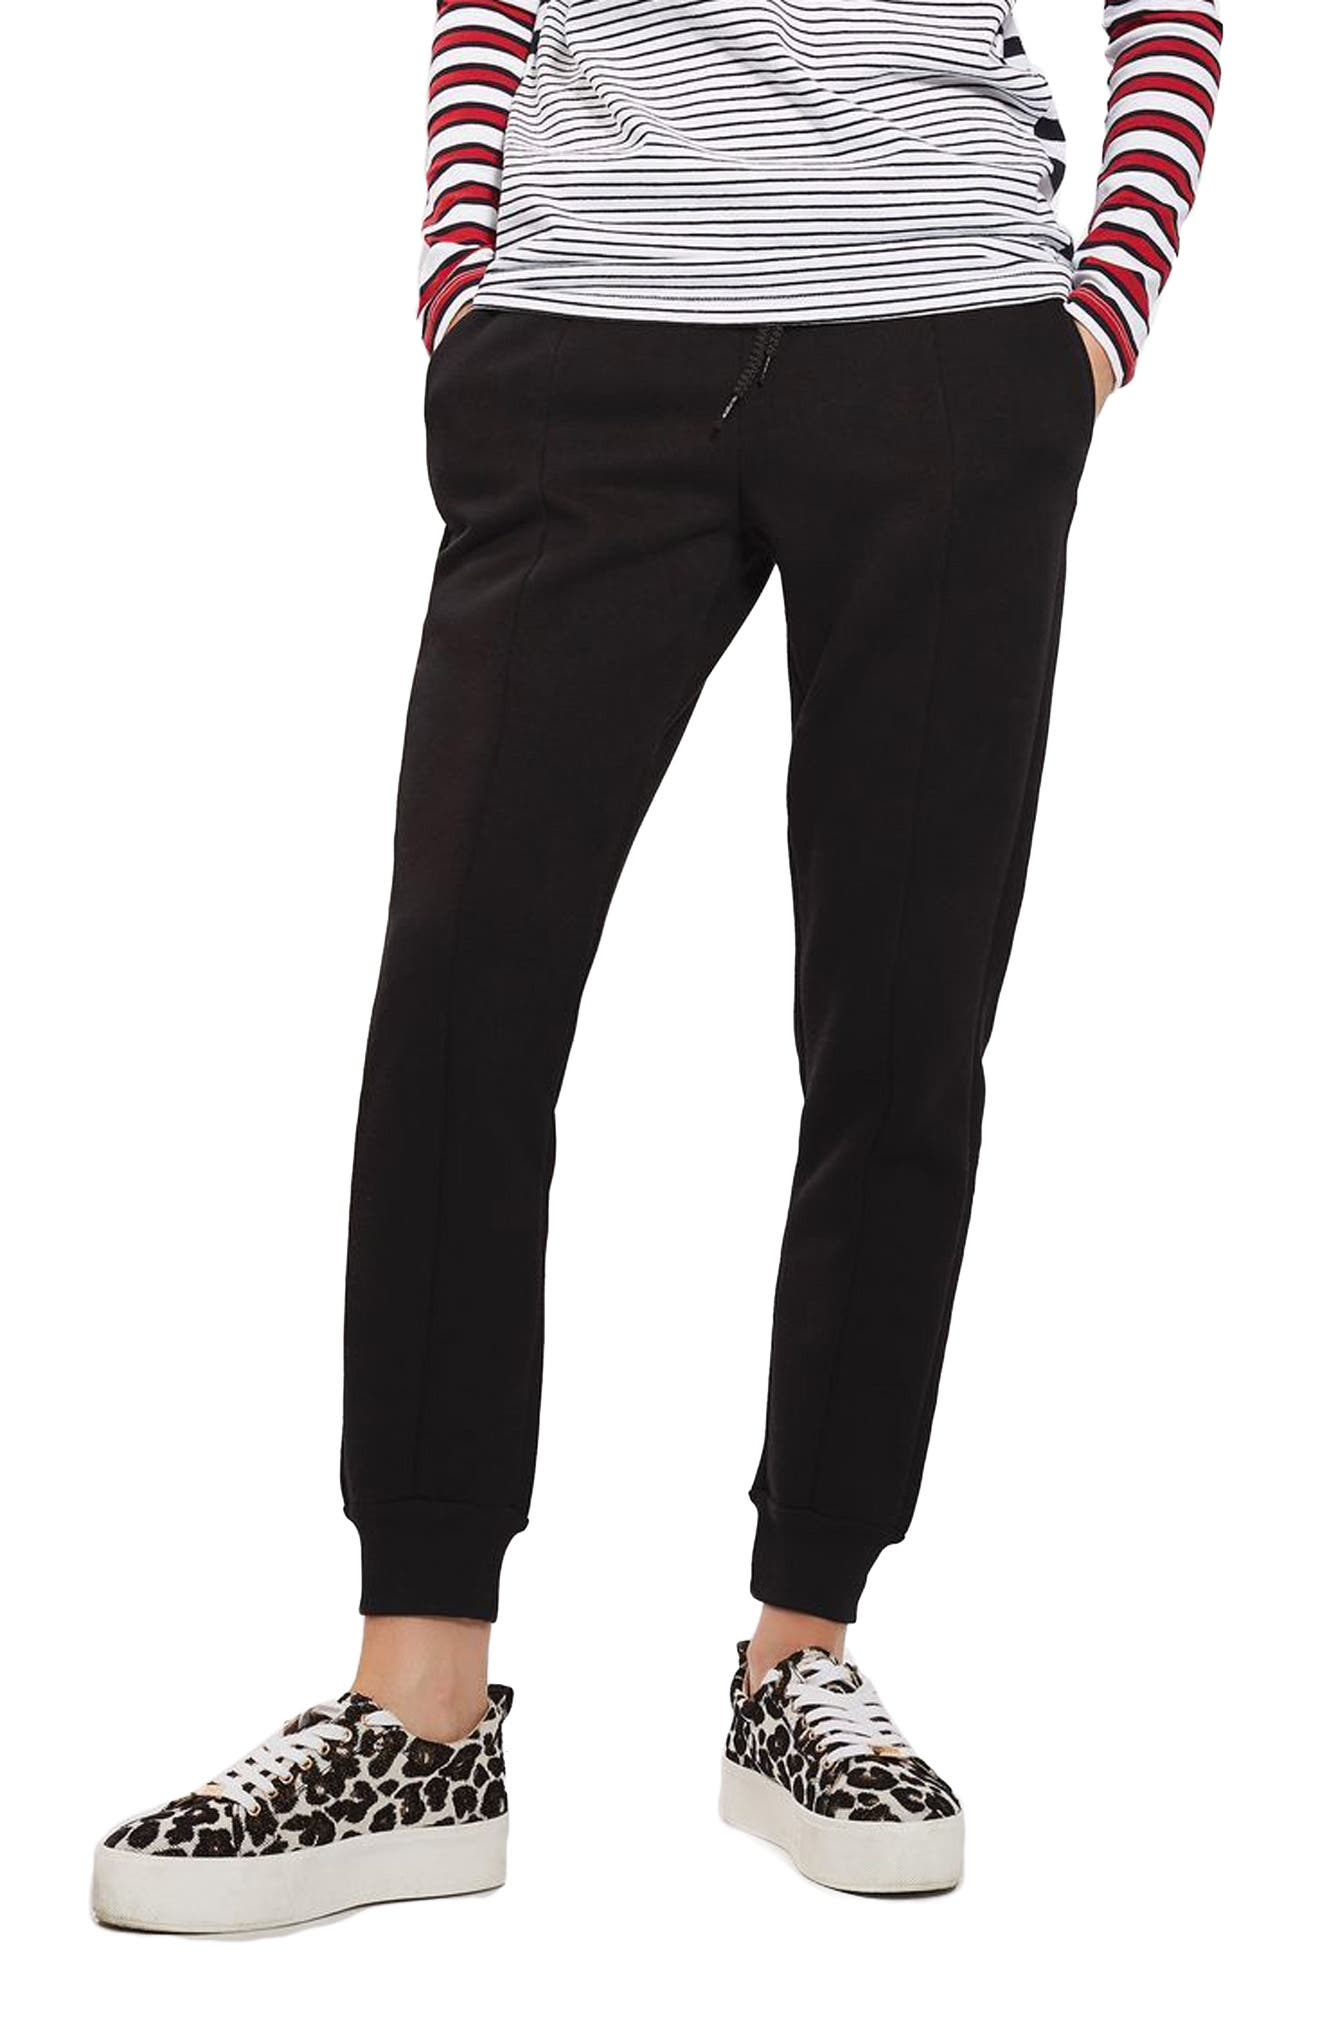 Clean Seam Jogger Pants,                         Main,                         color, Black